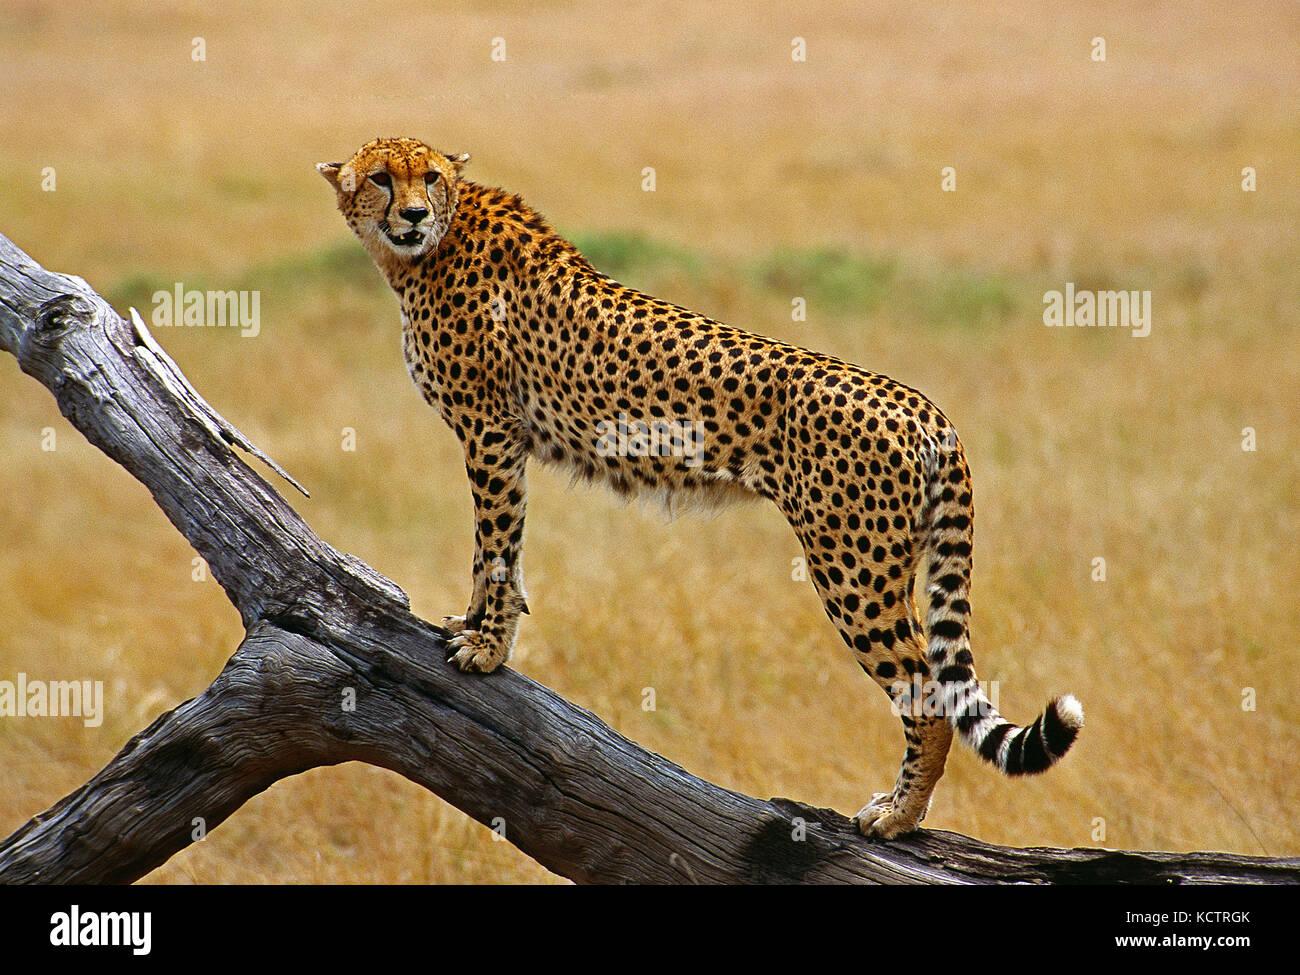 Africa. Kenya. Maasai Mara National Reserve. Wildlife. Cheetah. - Stock Image